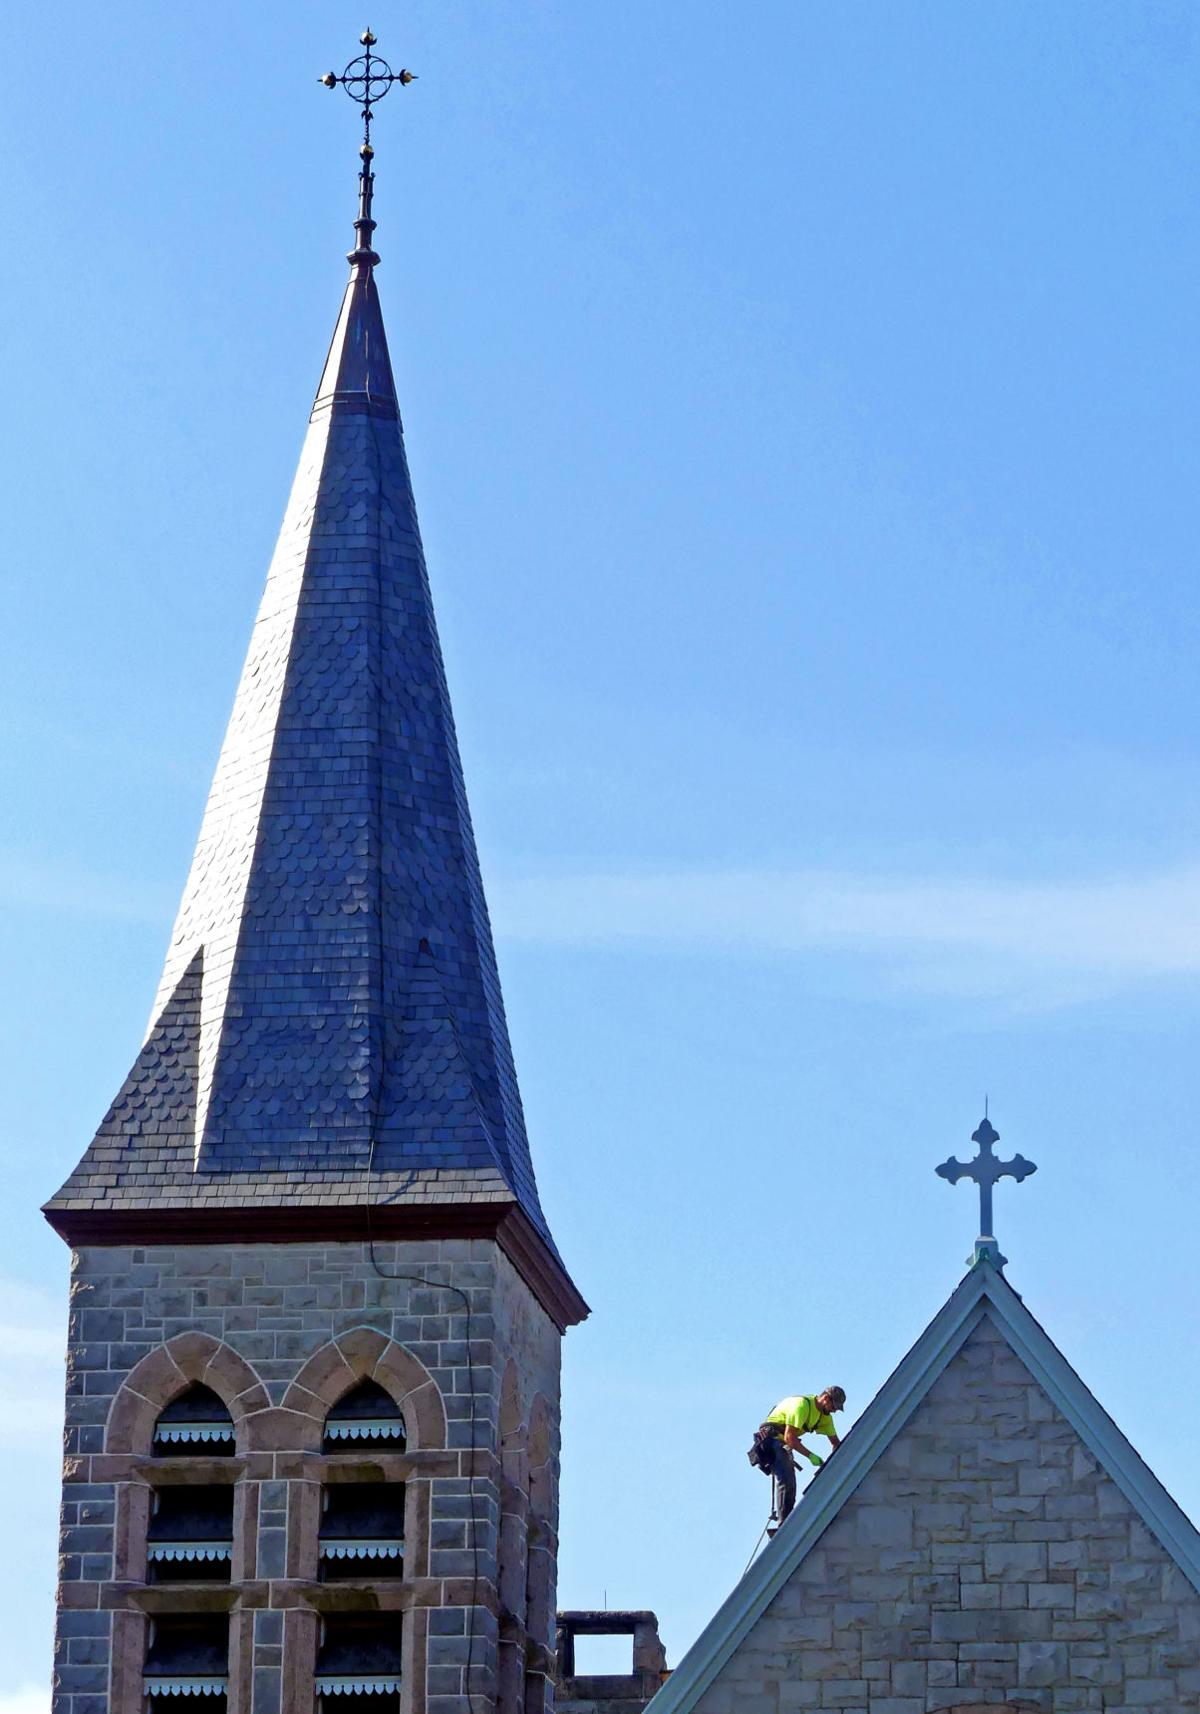 080519 WES Christ Church roof work 595.JPG